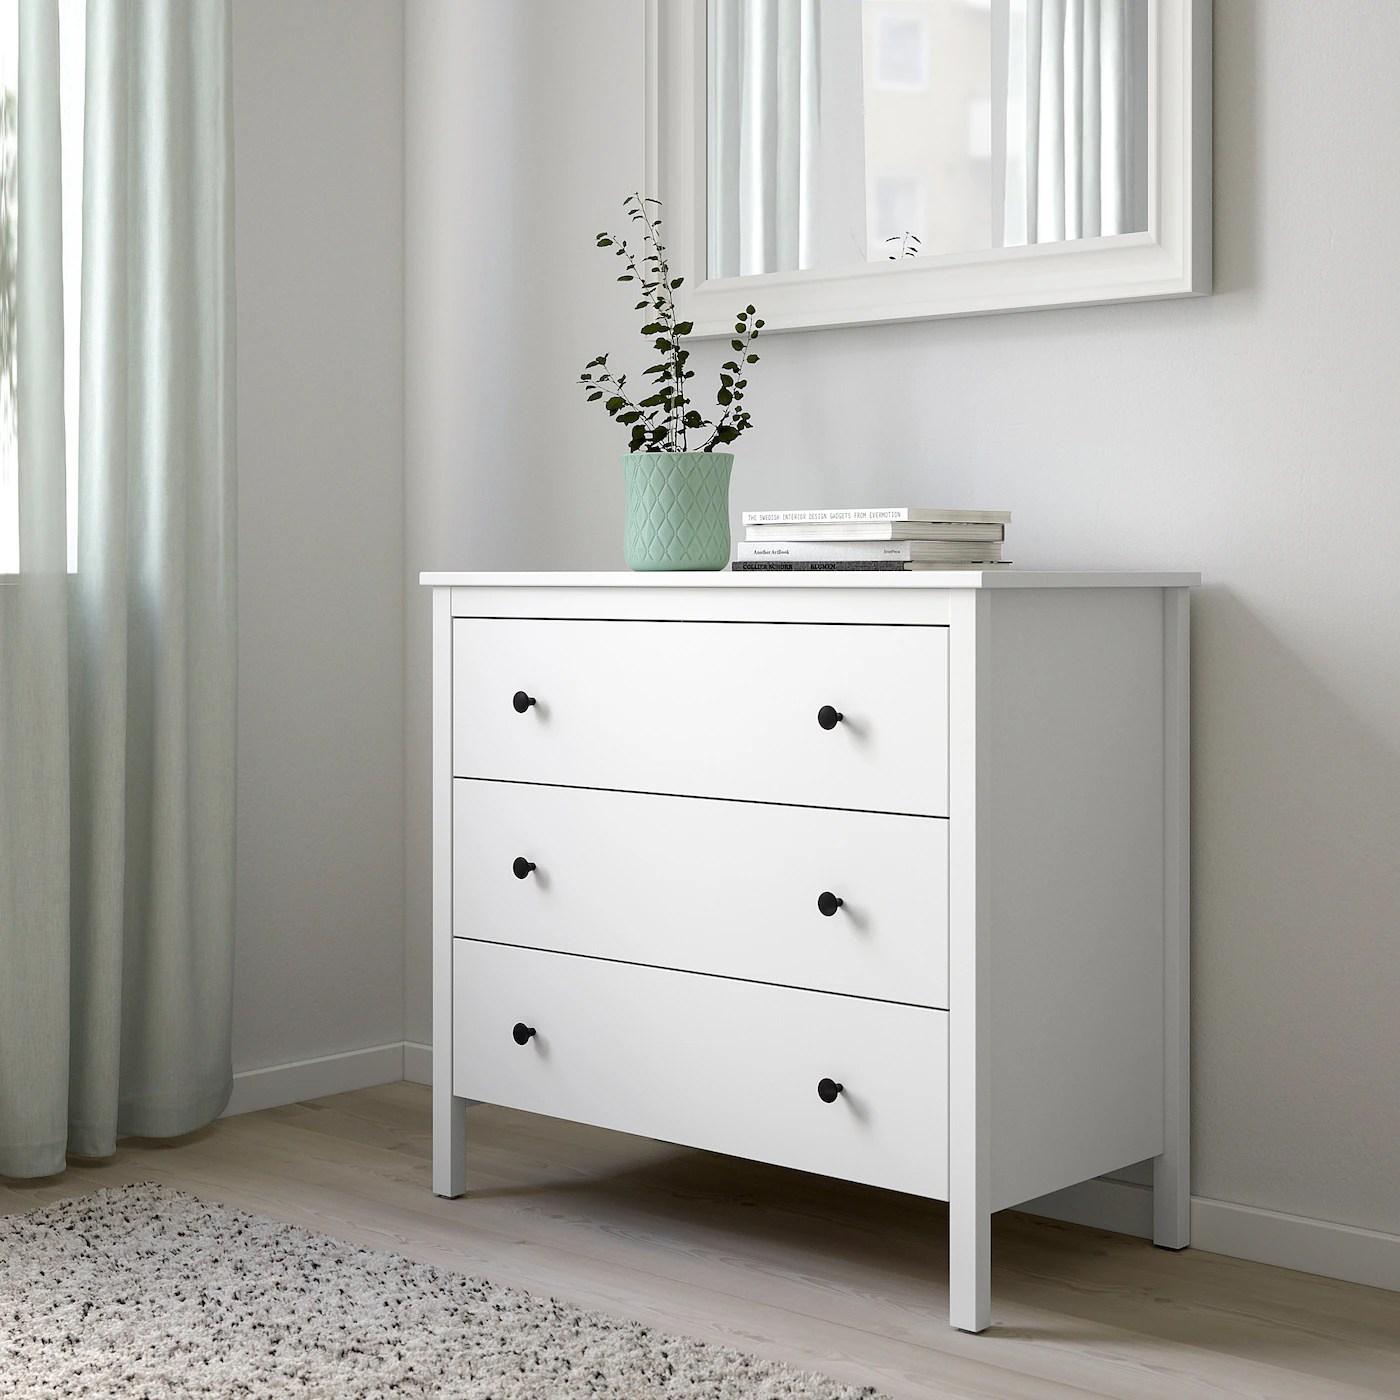 KOPPANG Cómoda de 3 cajones, blanco90x83 cm para dormitorio de matrimonio nórdico de Ikea